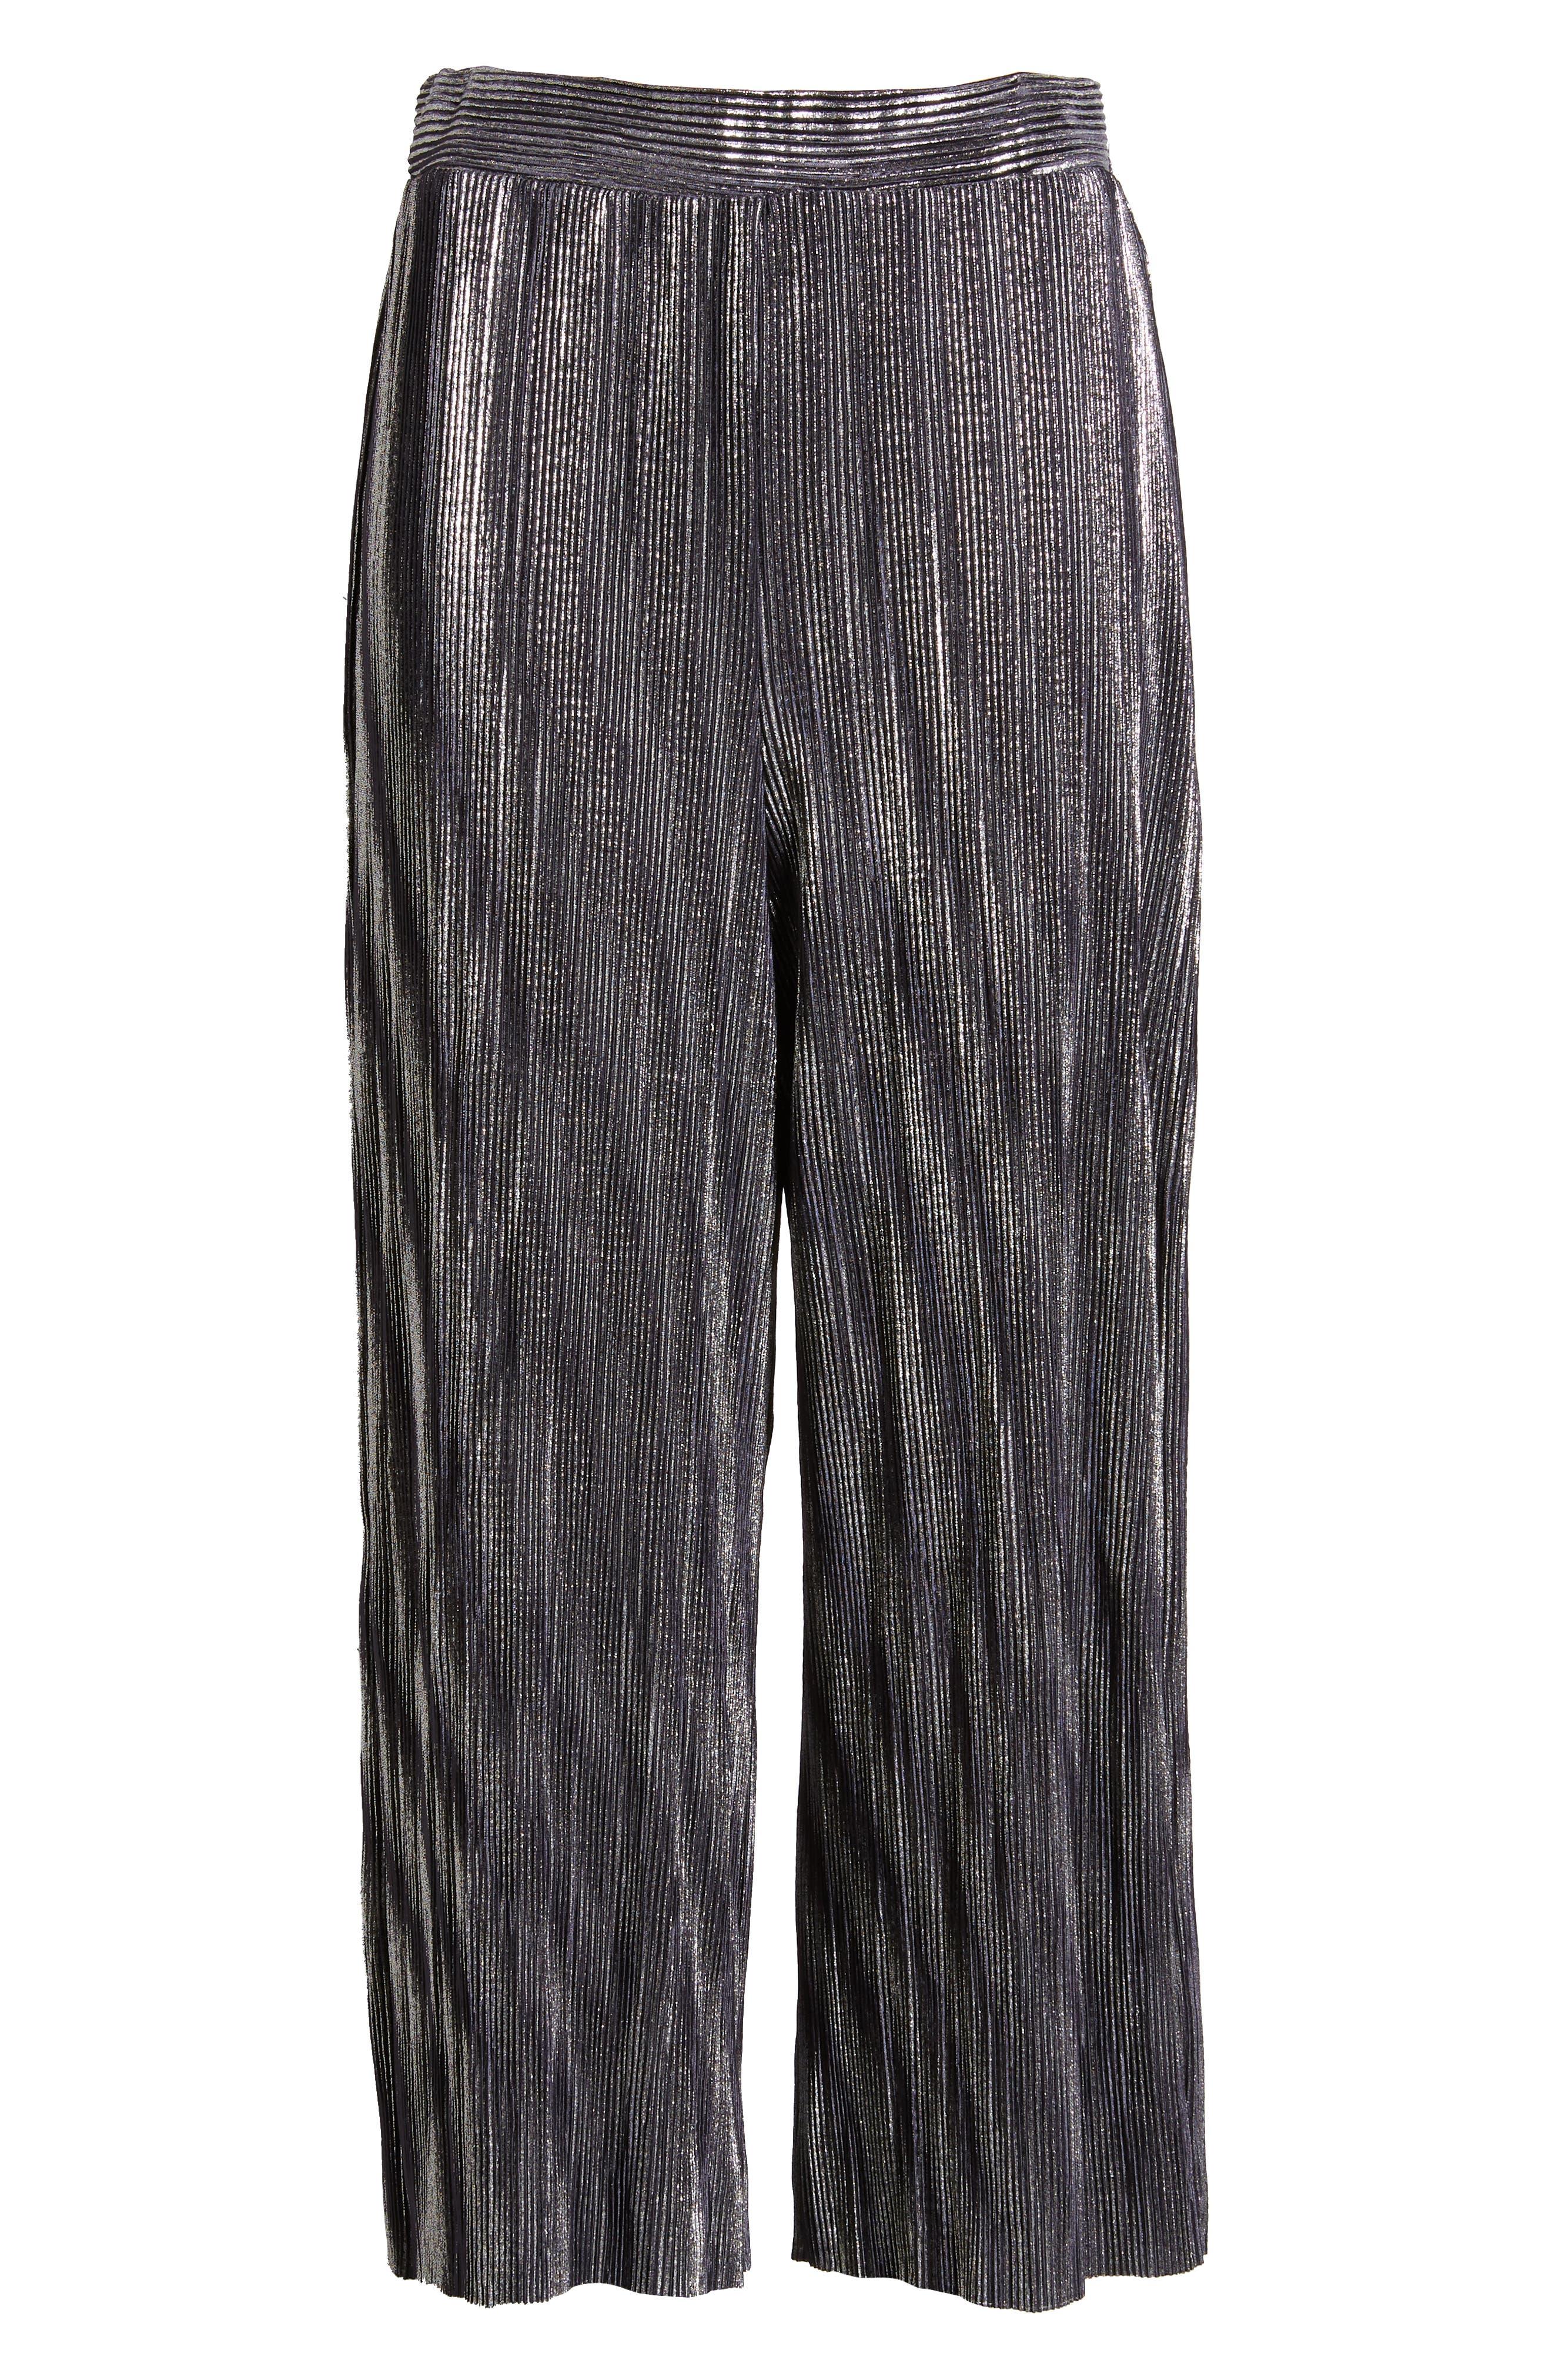 Metallic Mini Pleat Gaucho Crop Pants,                             Alternate thumbnail 6, color,                             SILVER